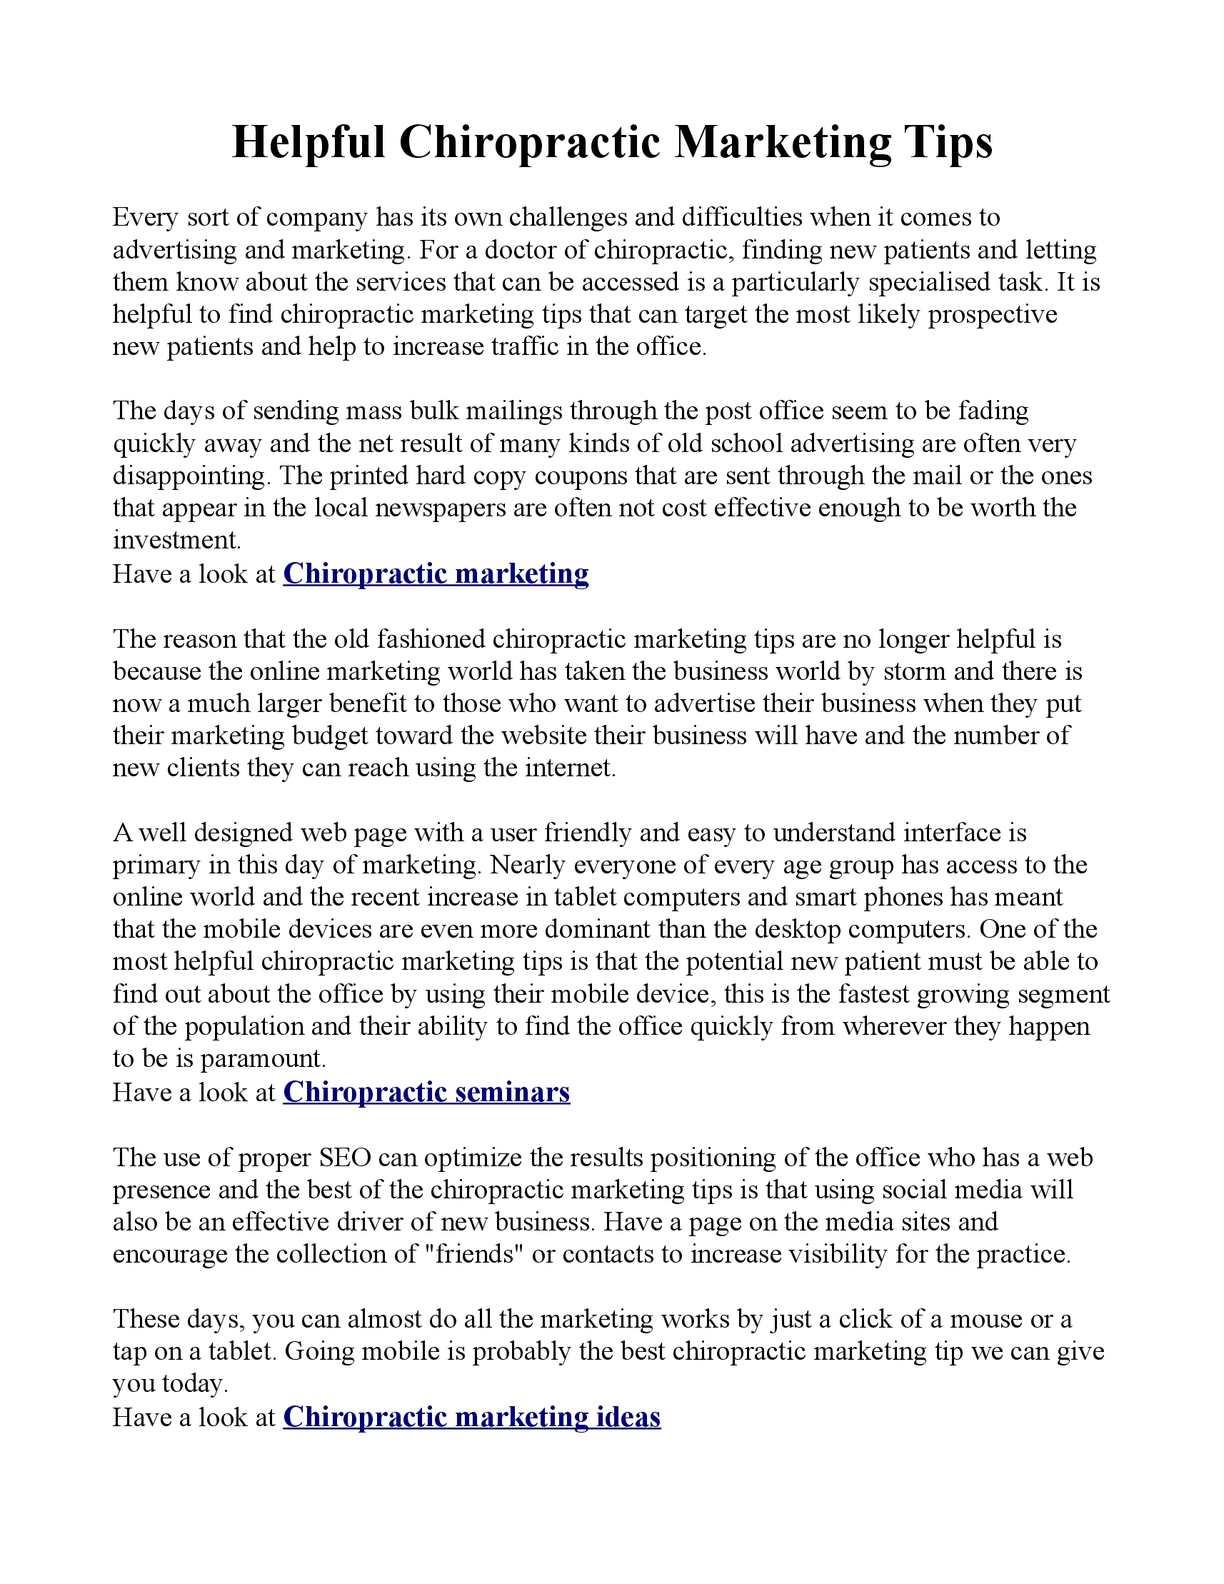 calaméo - helpful chiropractic marketing tips